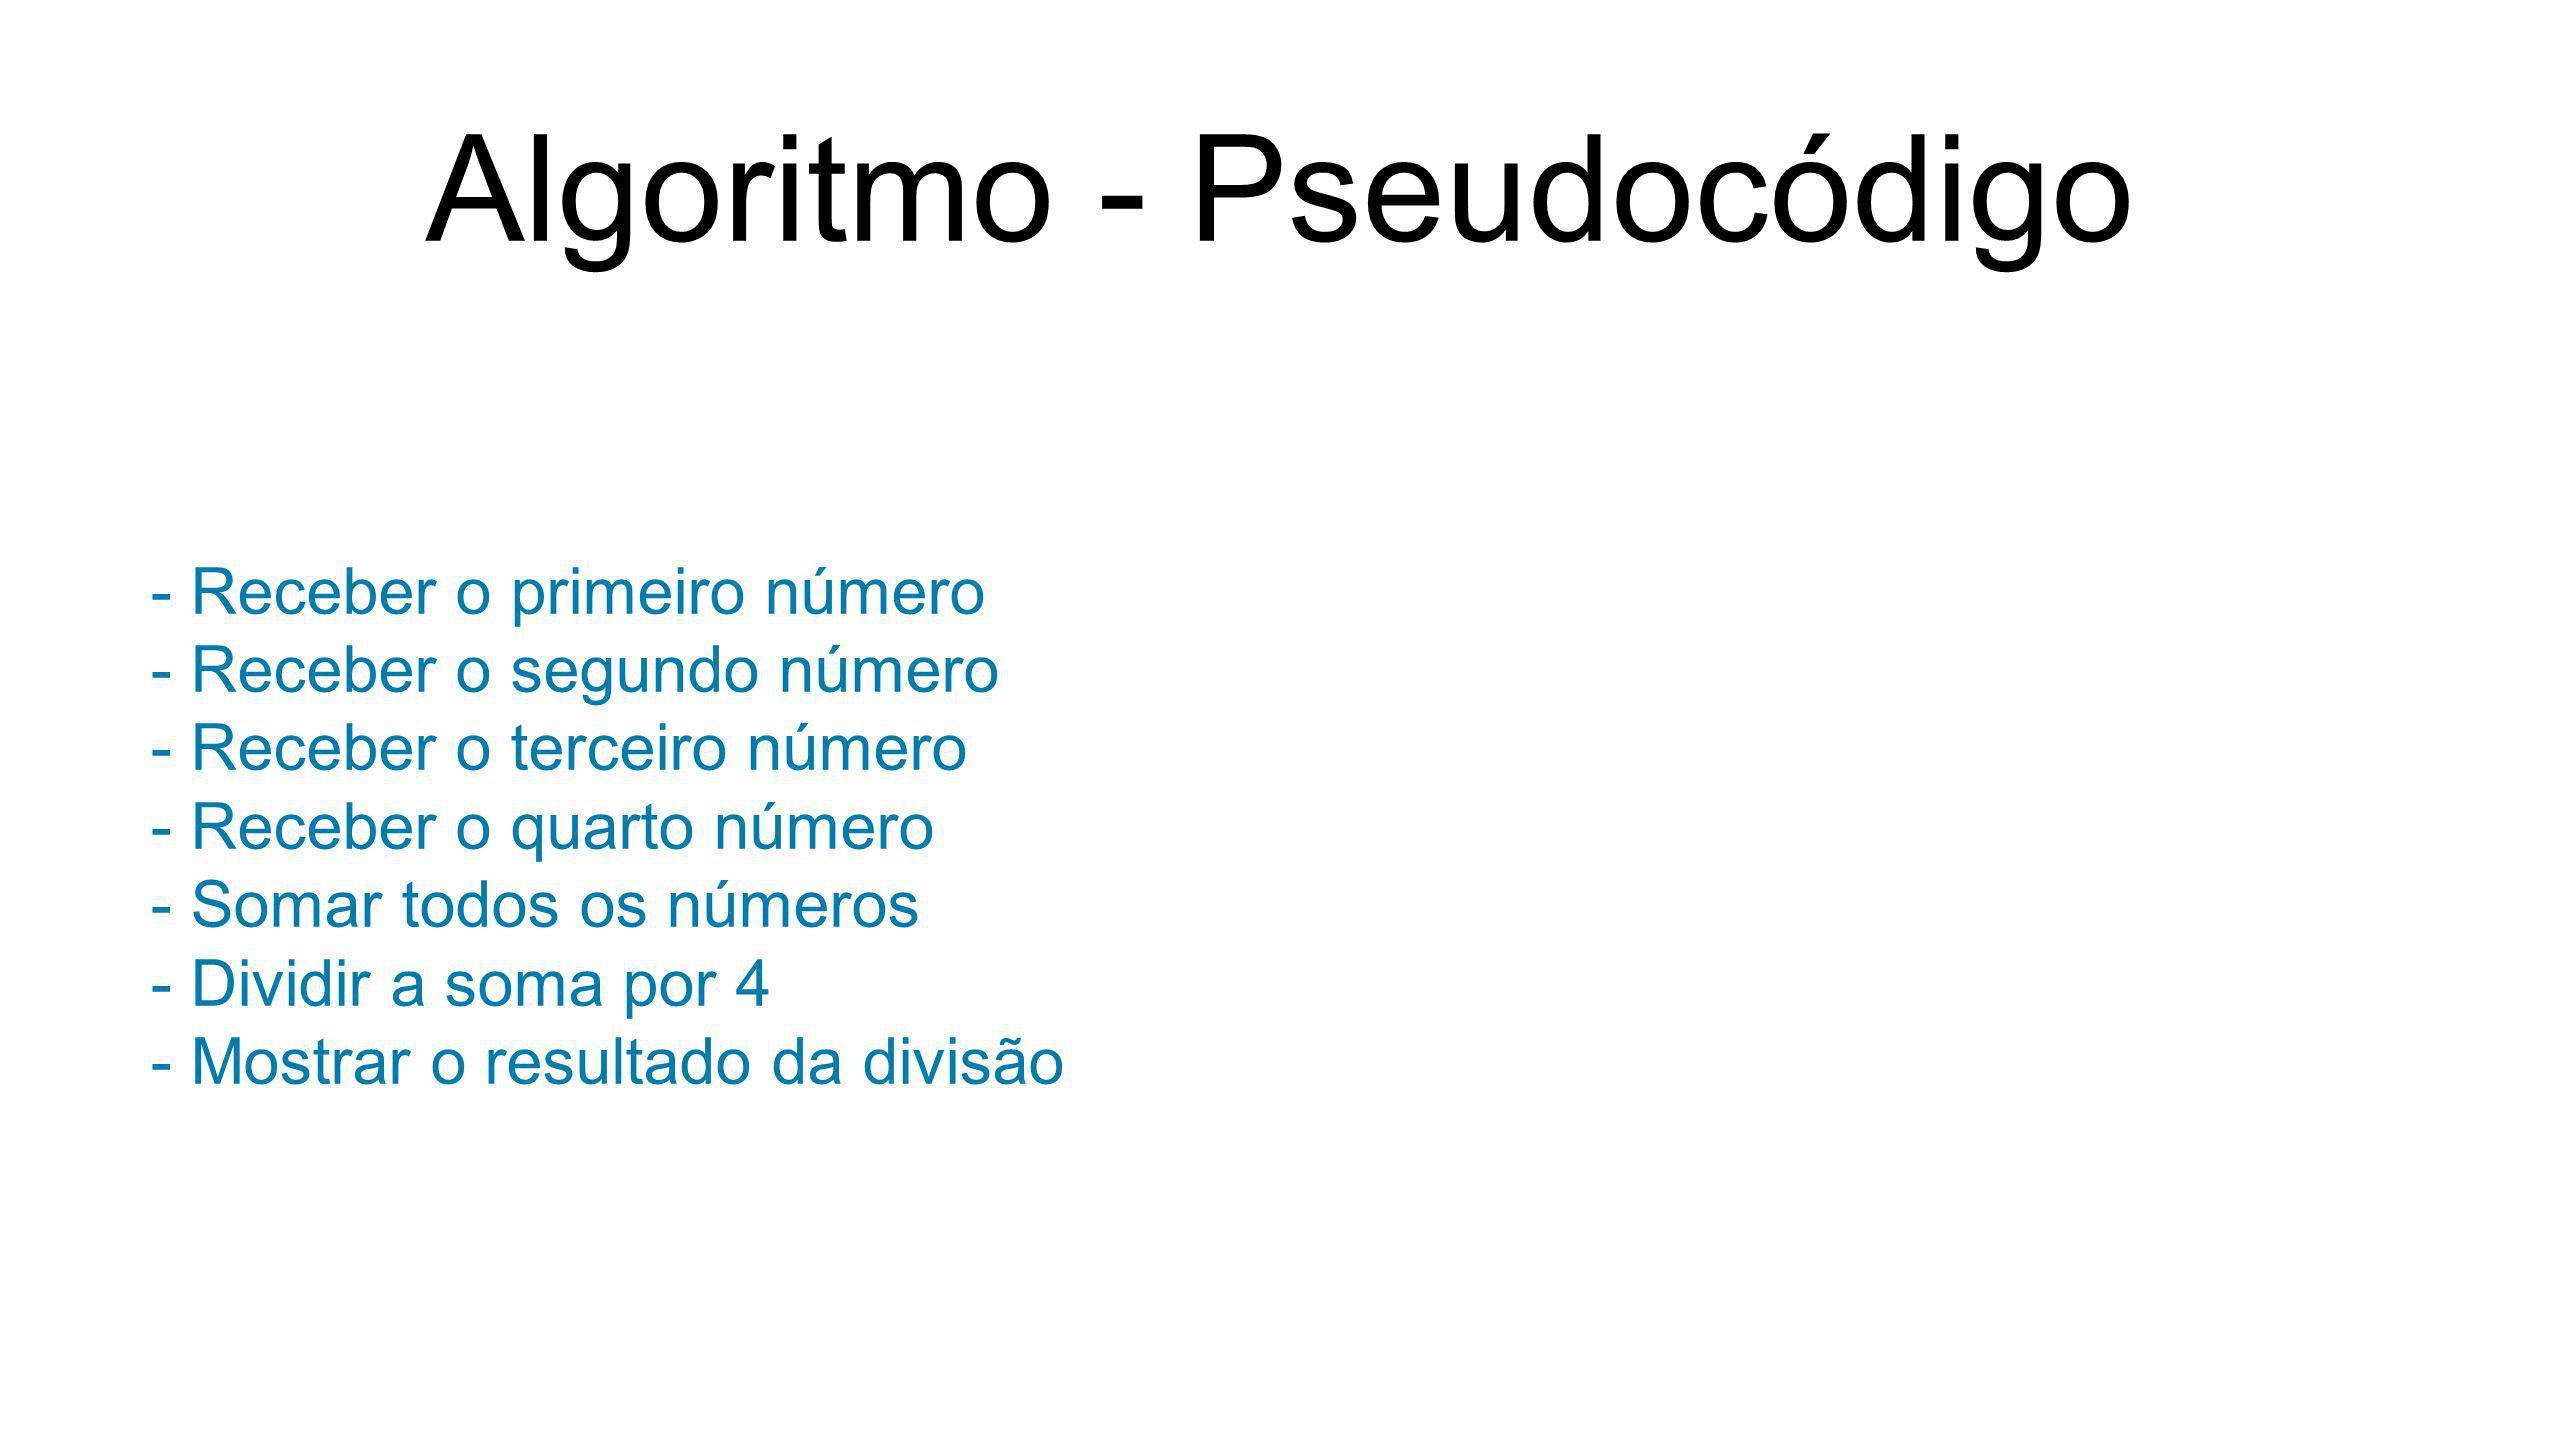 Algoritmo - Pseudocódigo - Receber o primeiro número - Receber o segundo número - Receber o terceiro número - Receber o quarto número - Somar todos os